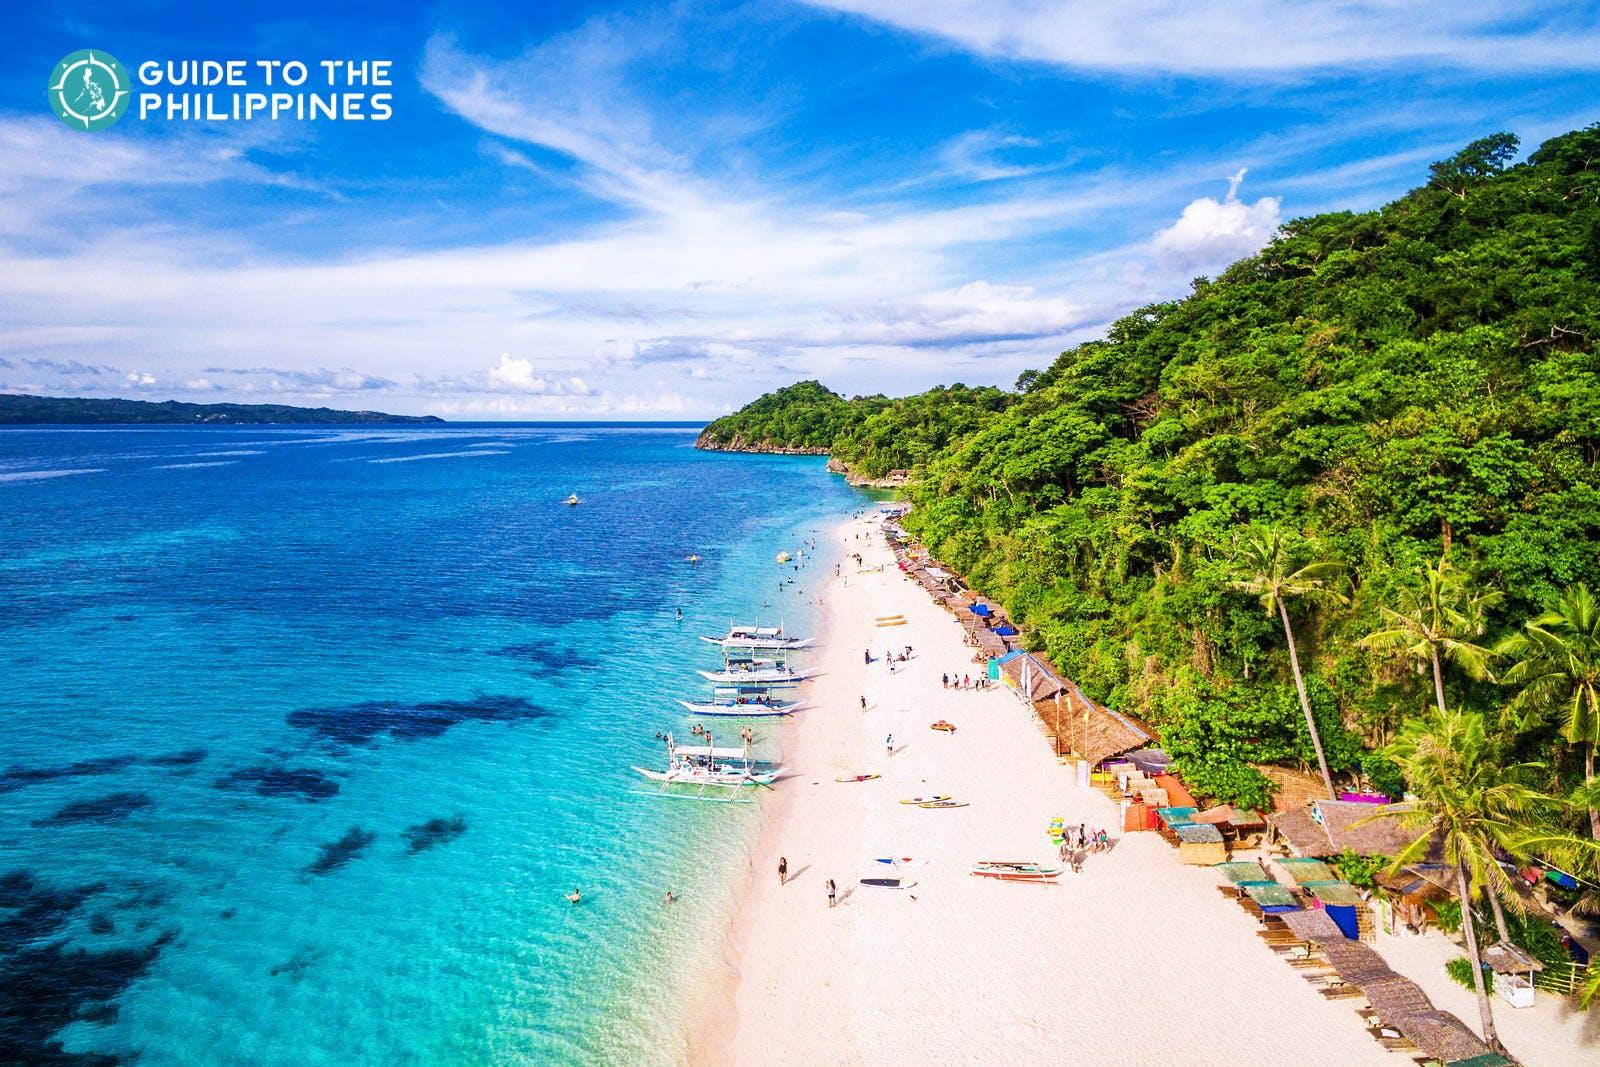 Aklan_Boracay_White Beach_Shutterstock_641355409.jpg